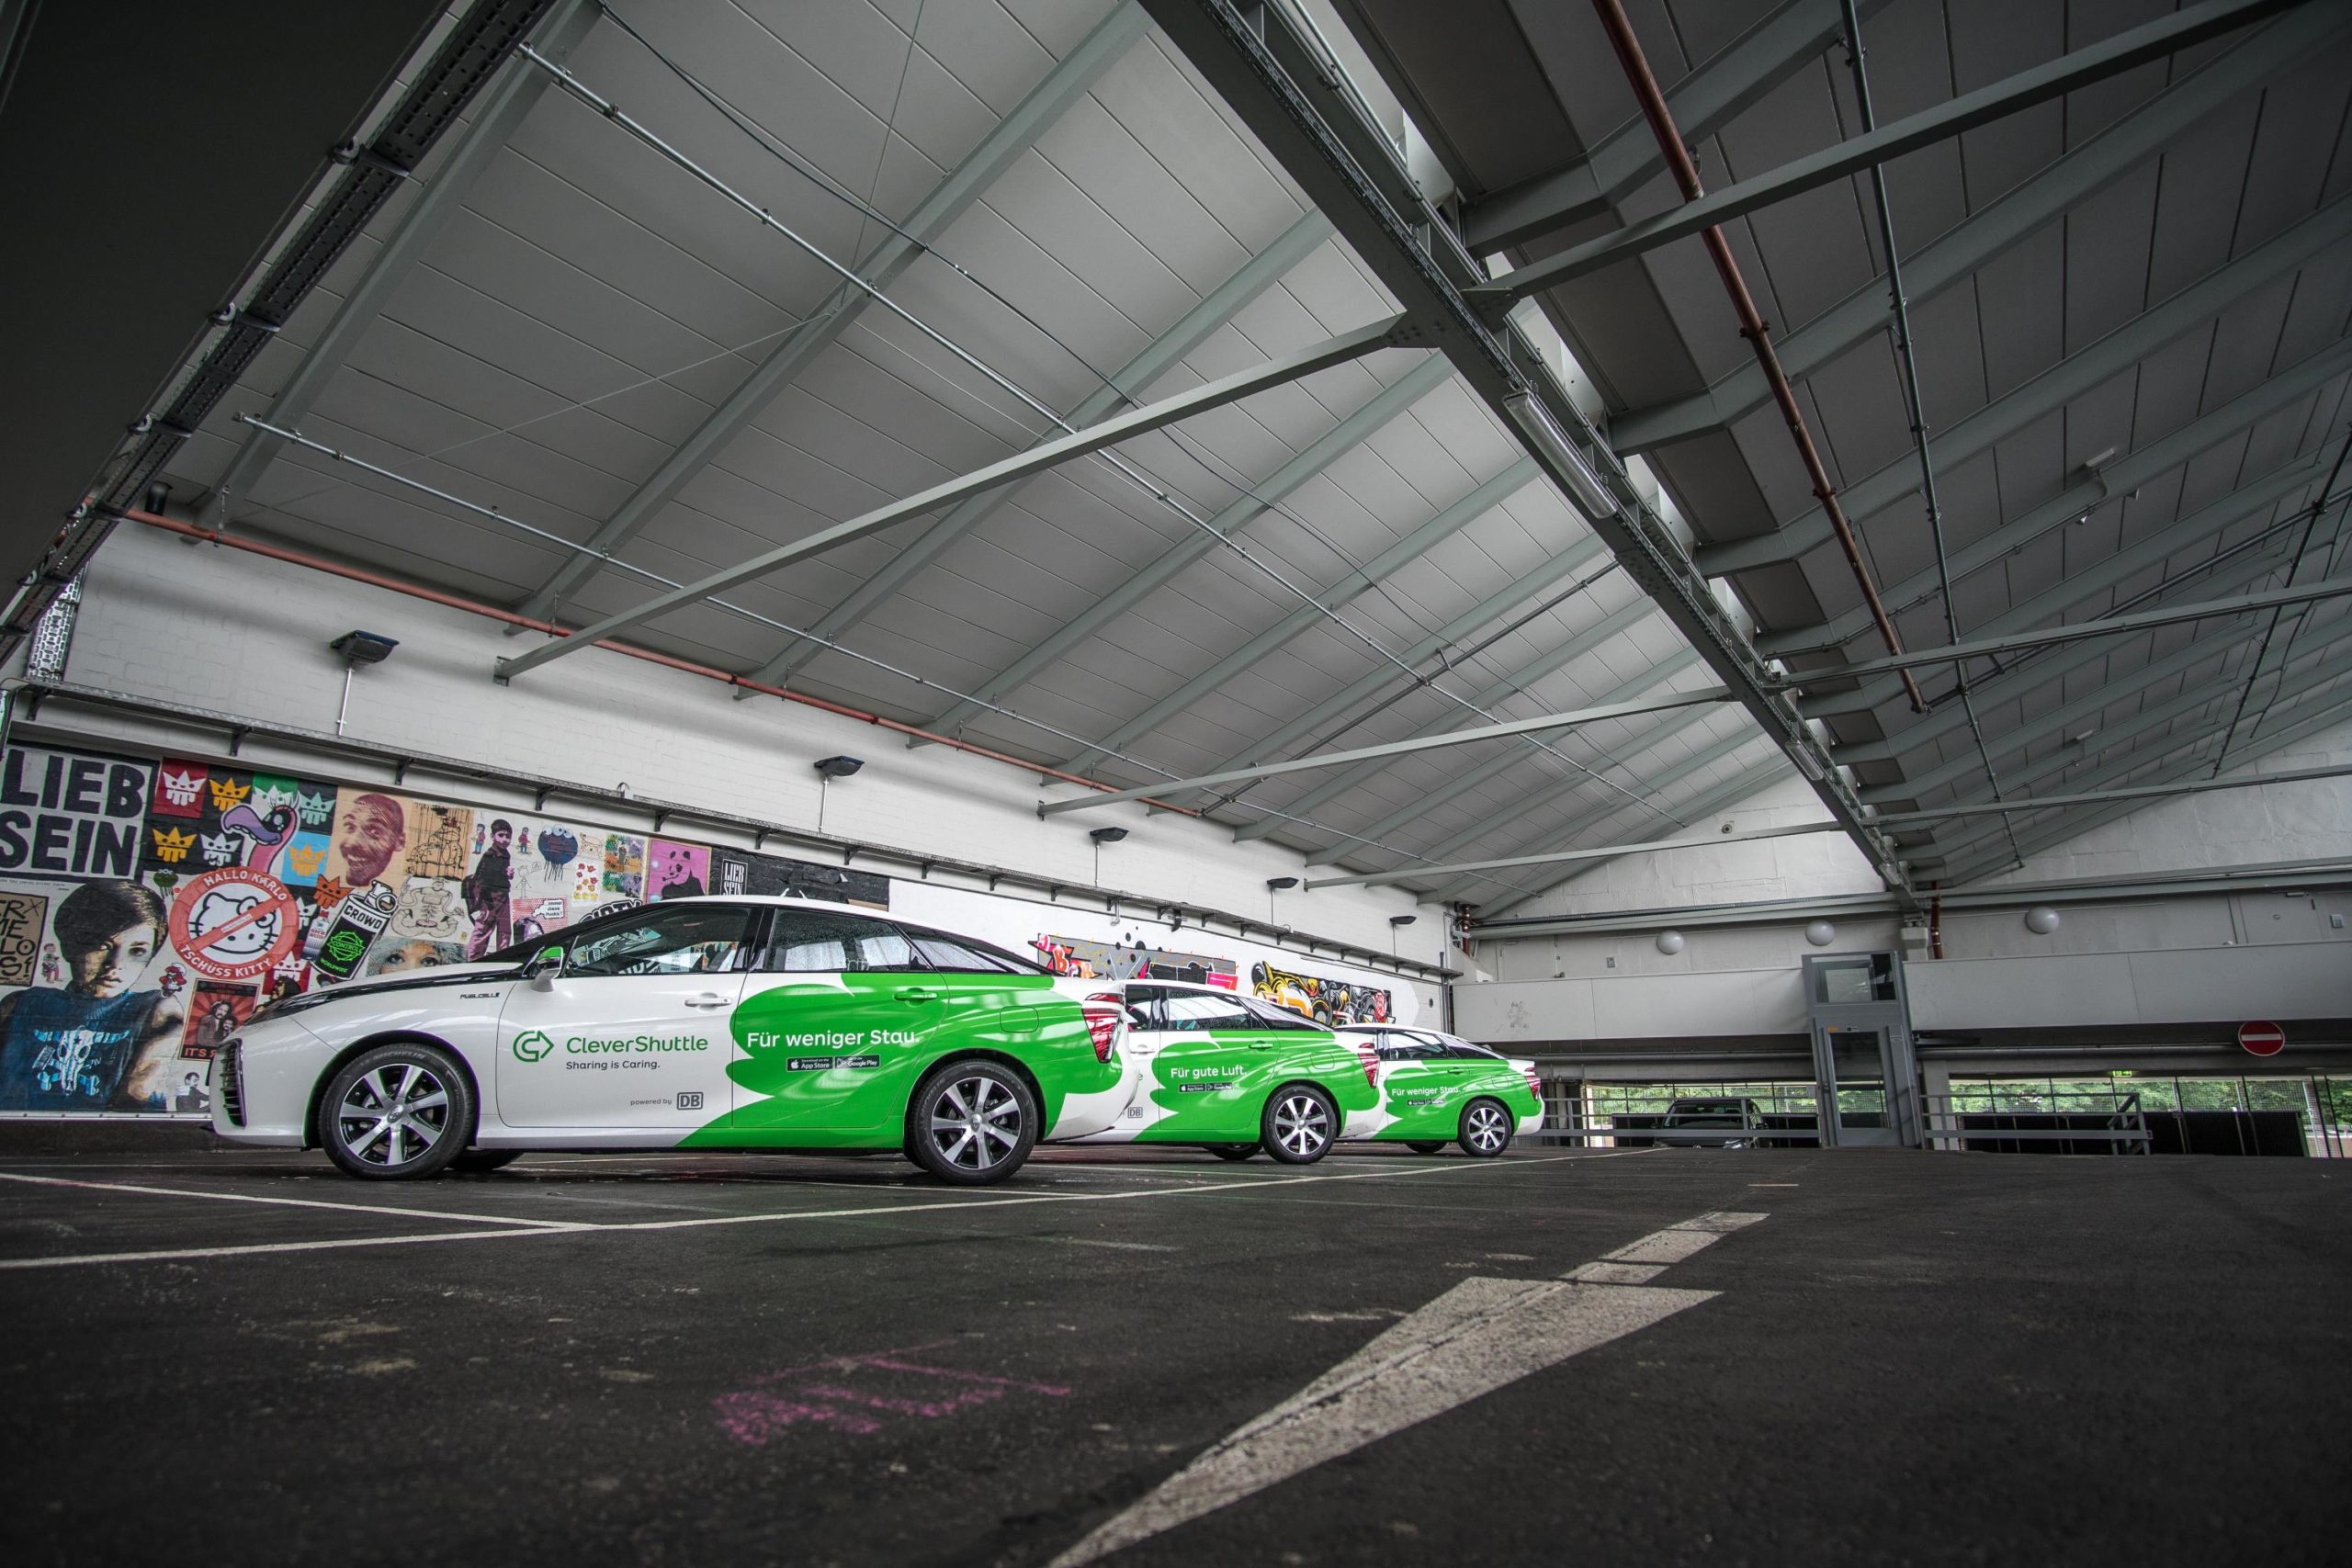 La flota de Toyota Mirai de CleverShuttle ha recorrido 5 Mill. de km